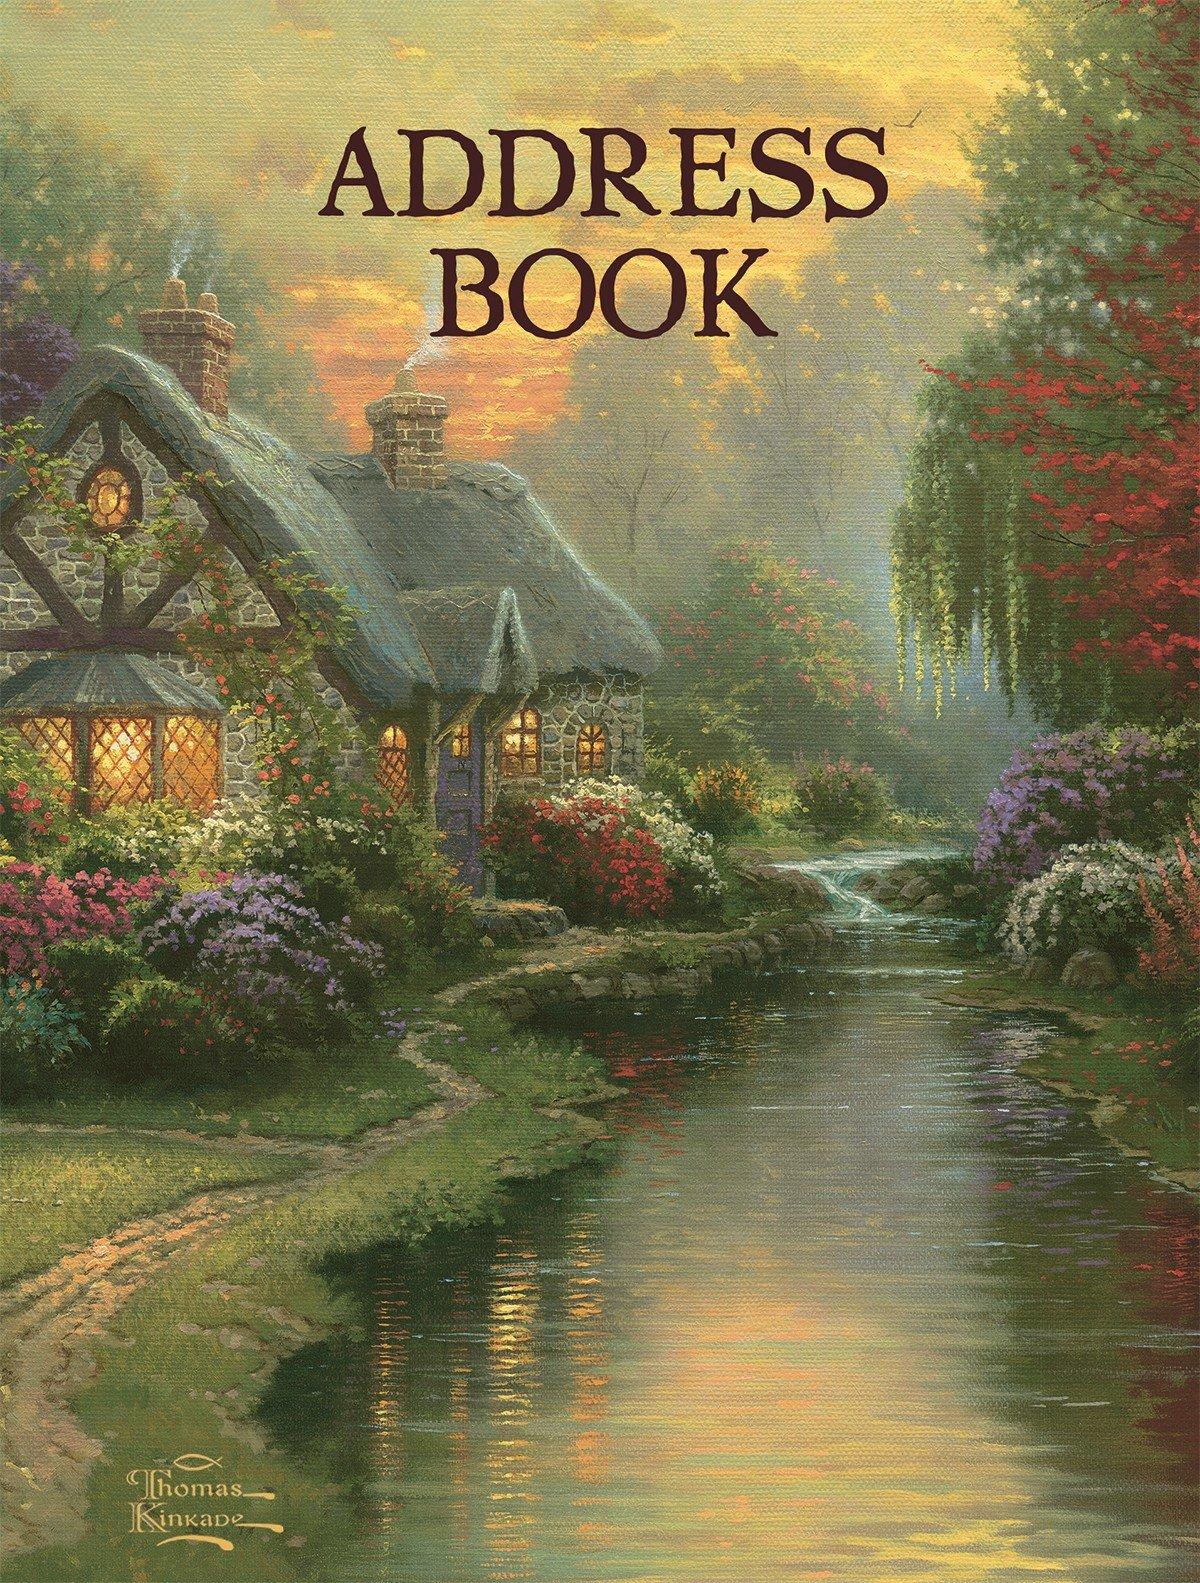 LANG - Address Book - ''A Quiet Evening'' - Art by Thomas Kinkade - 3-Ring - Refillable - 6 1/2'' x 8 1/2''